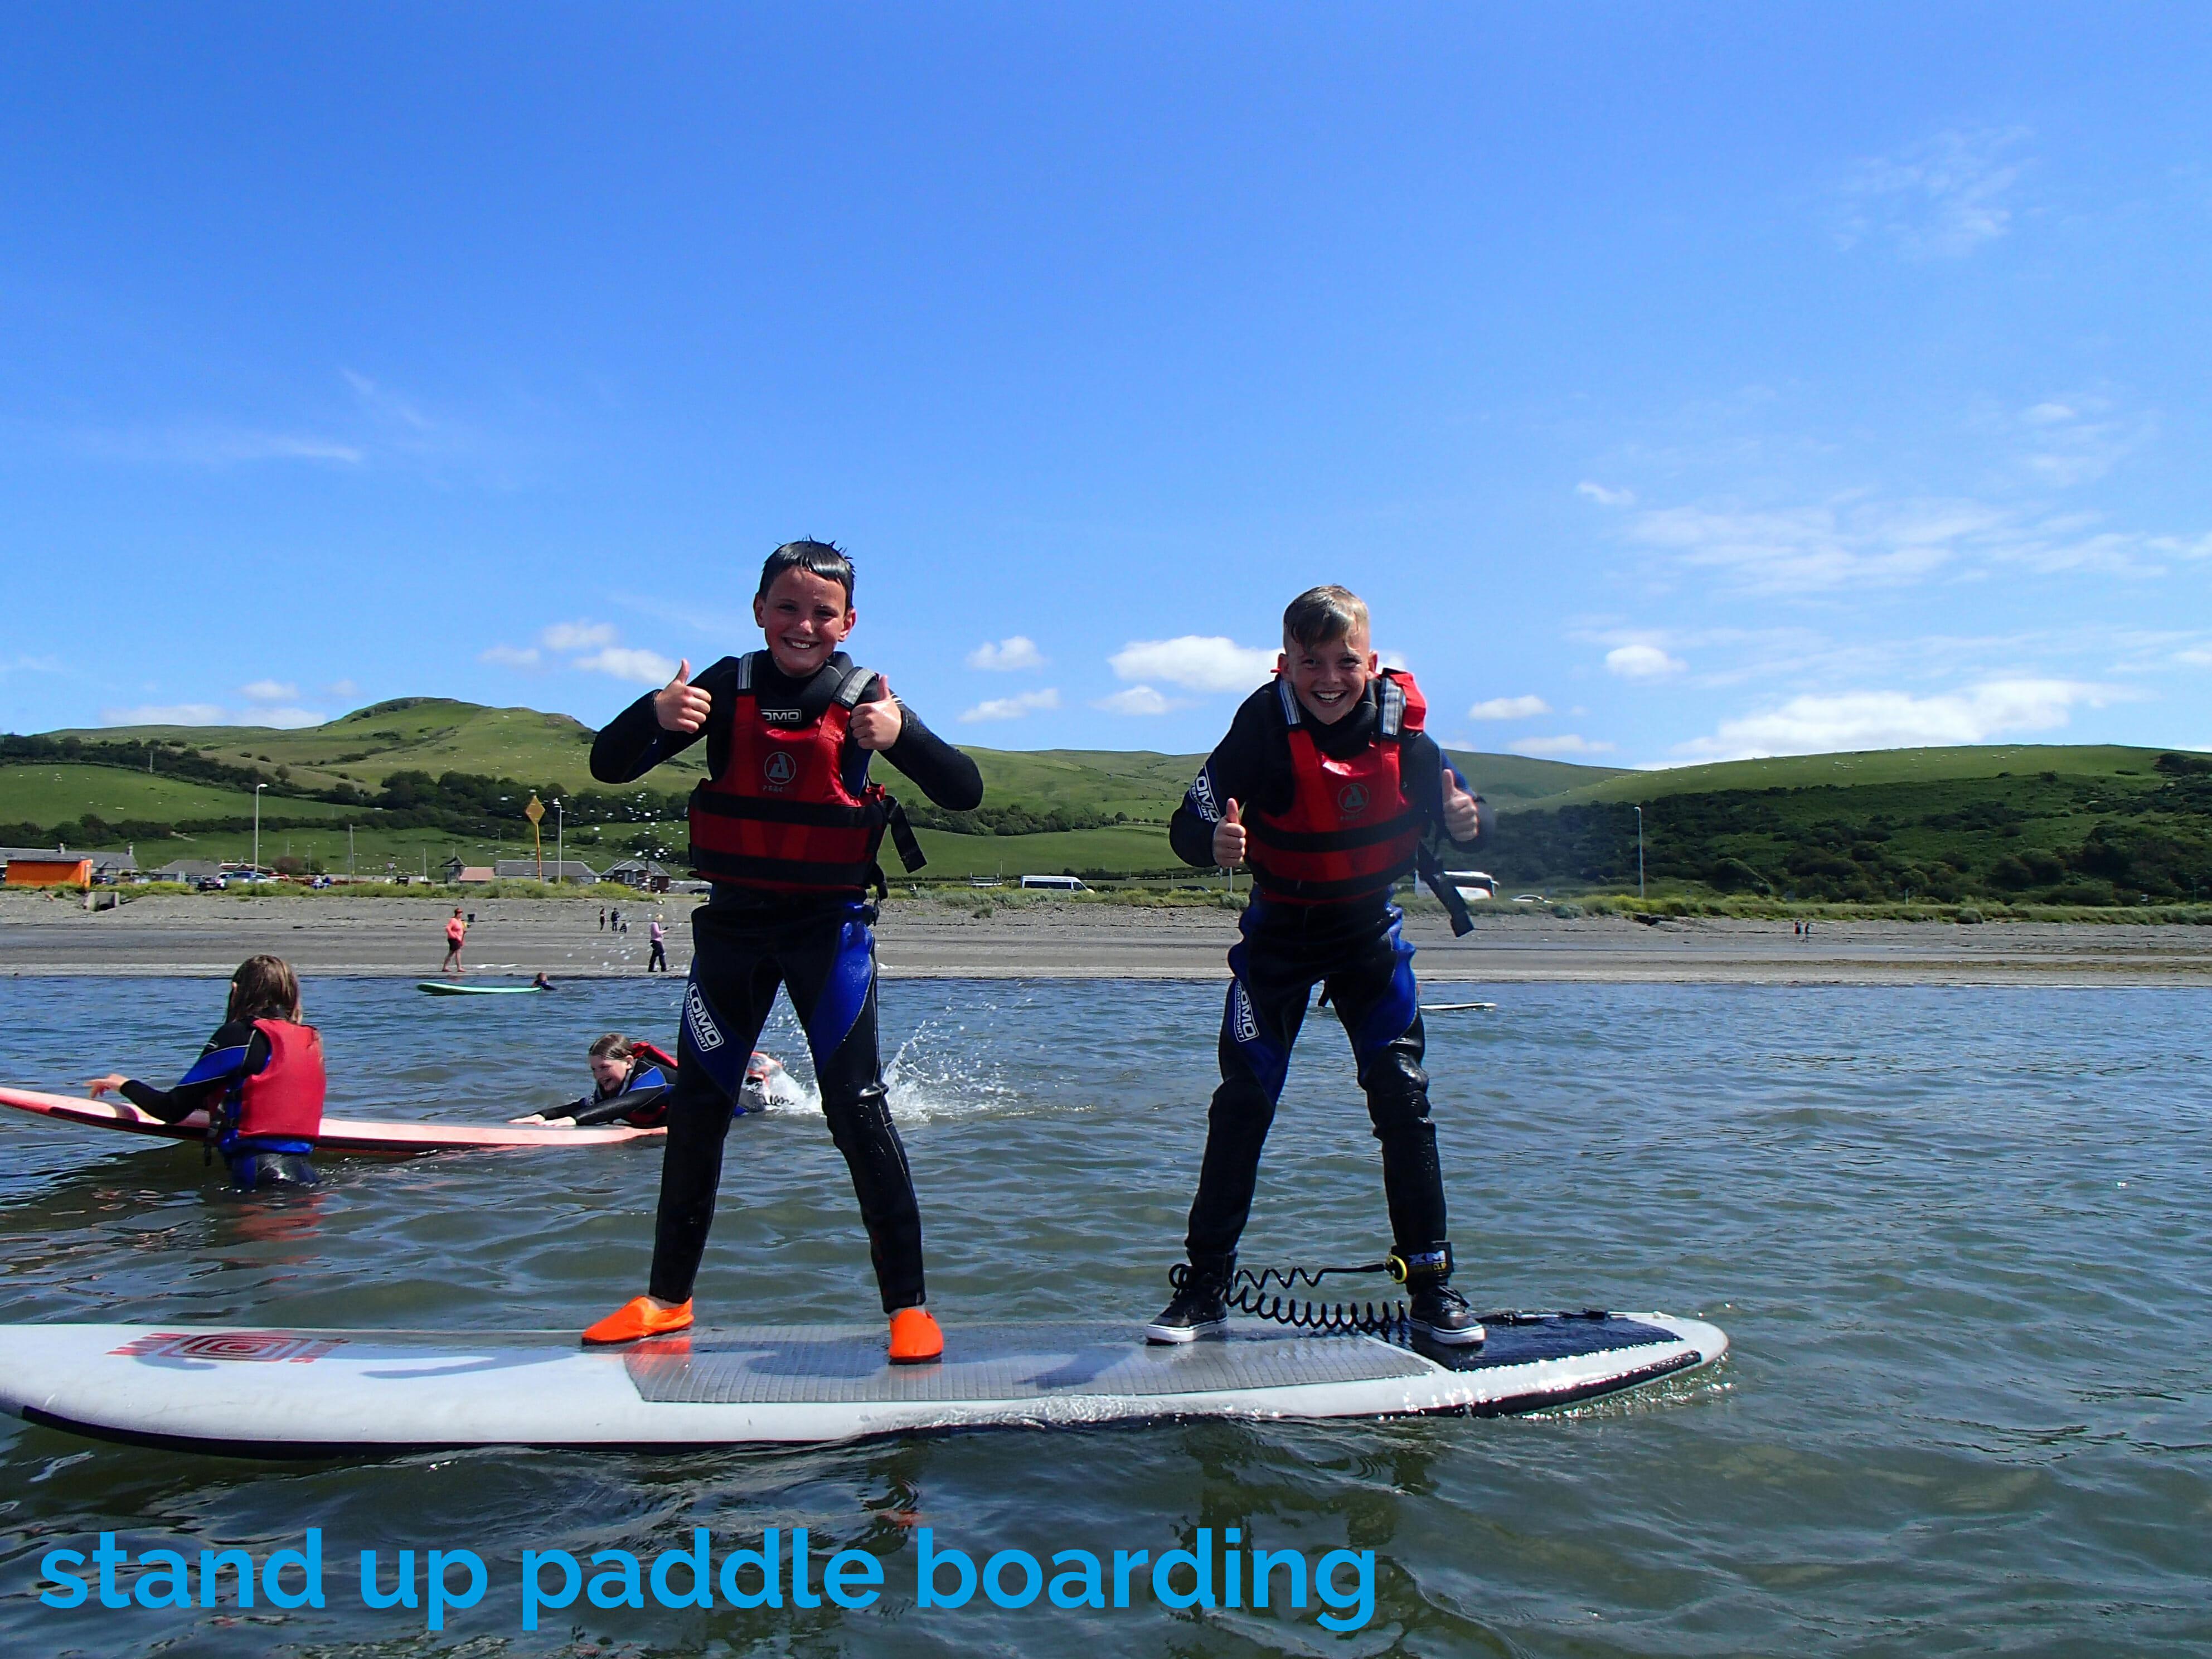 paddle boarding kids